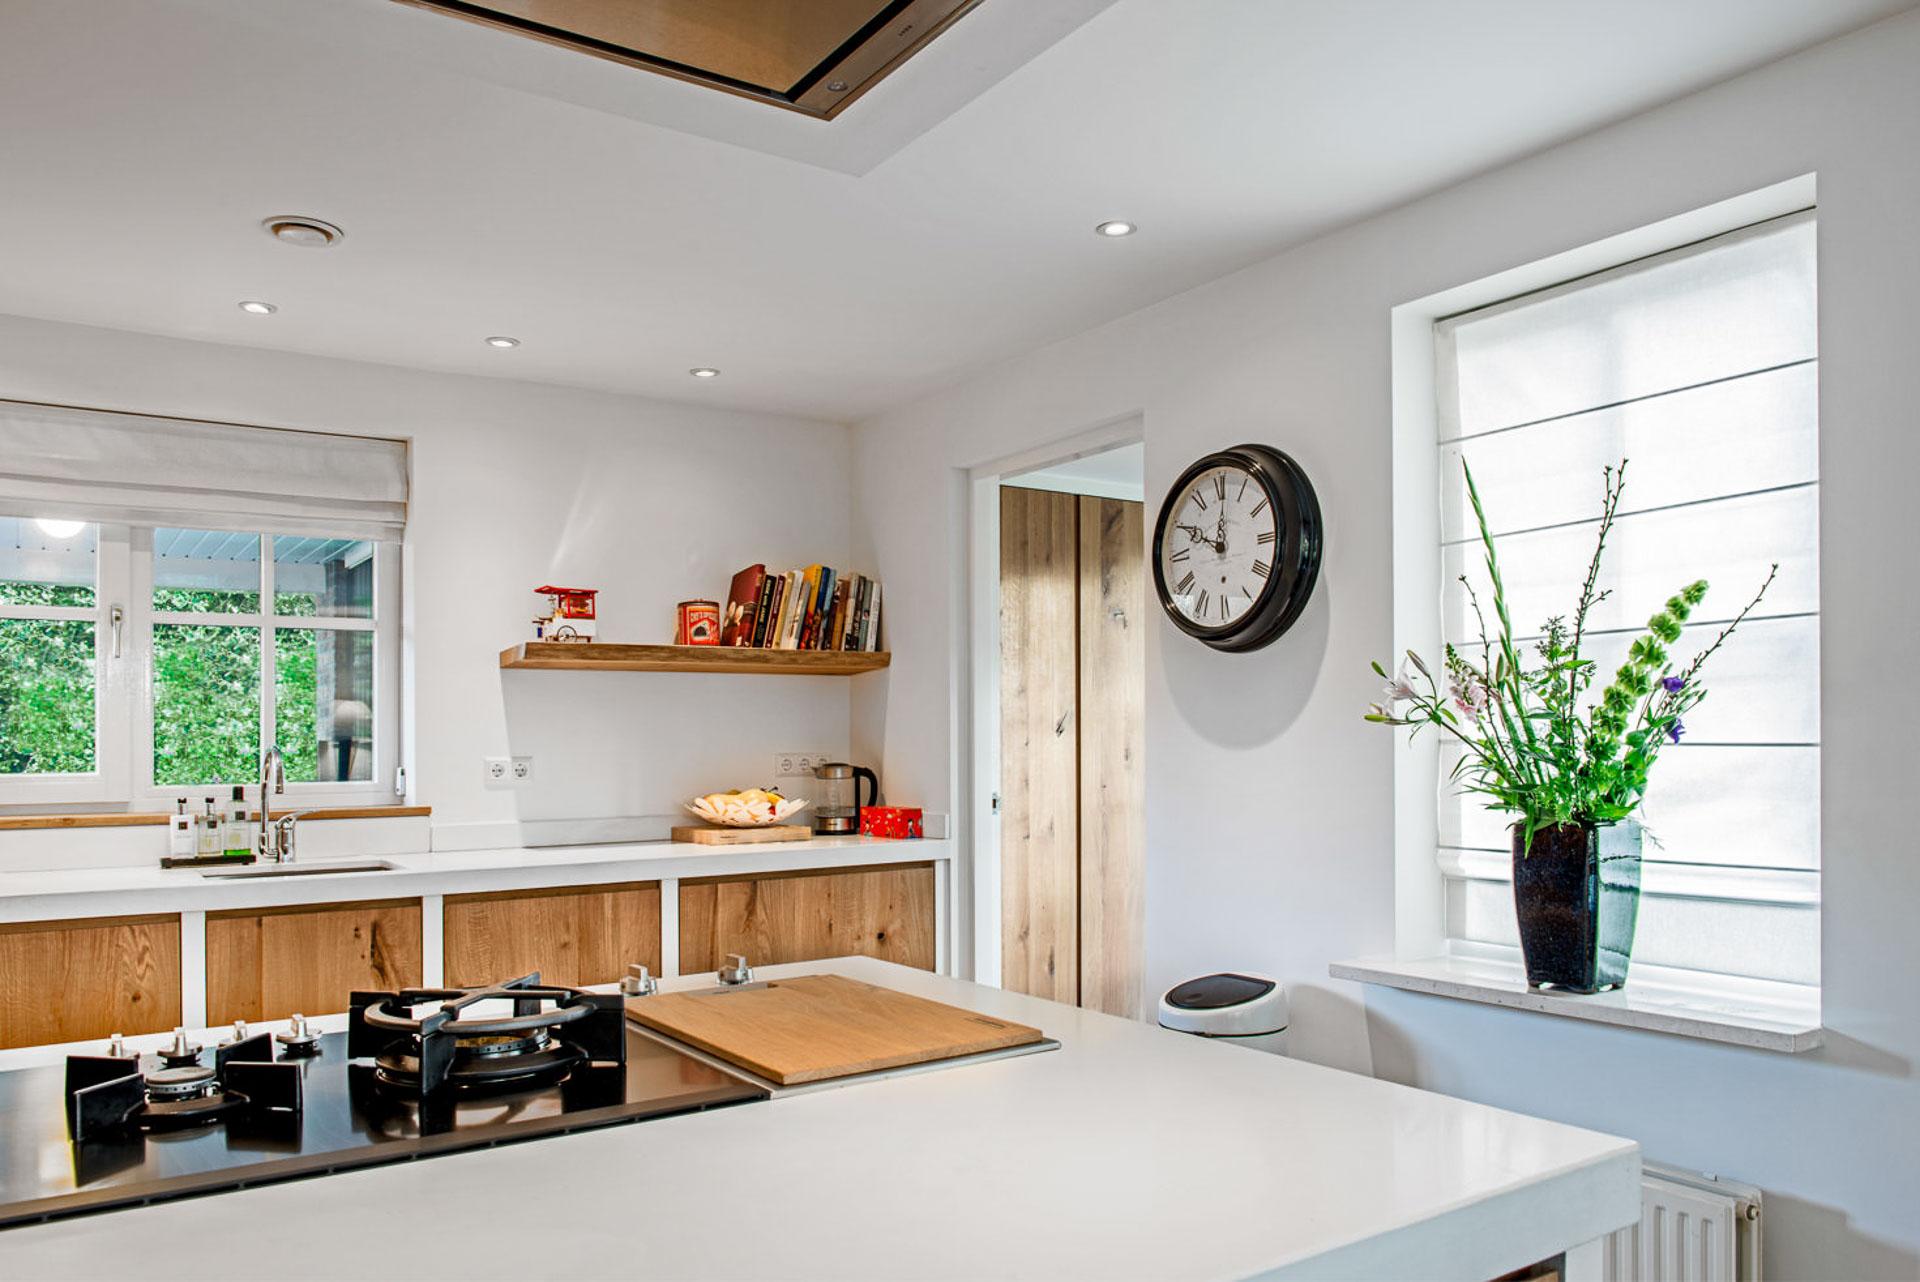 Massief wit eikenhouten keuken